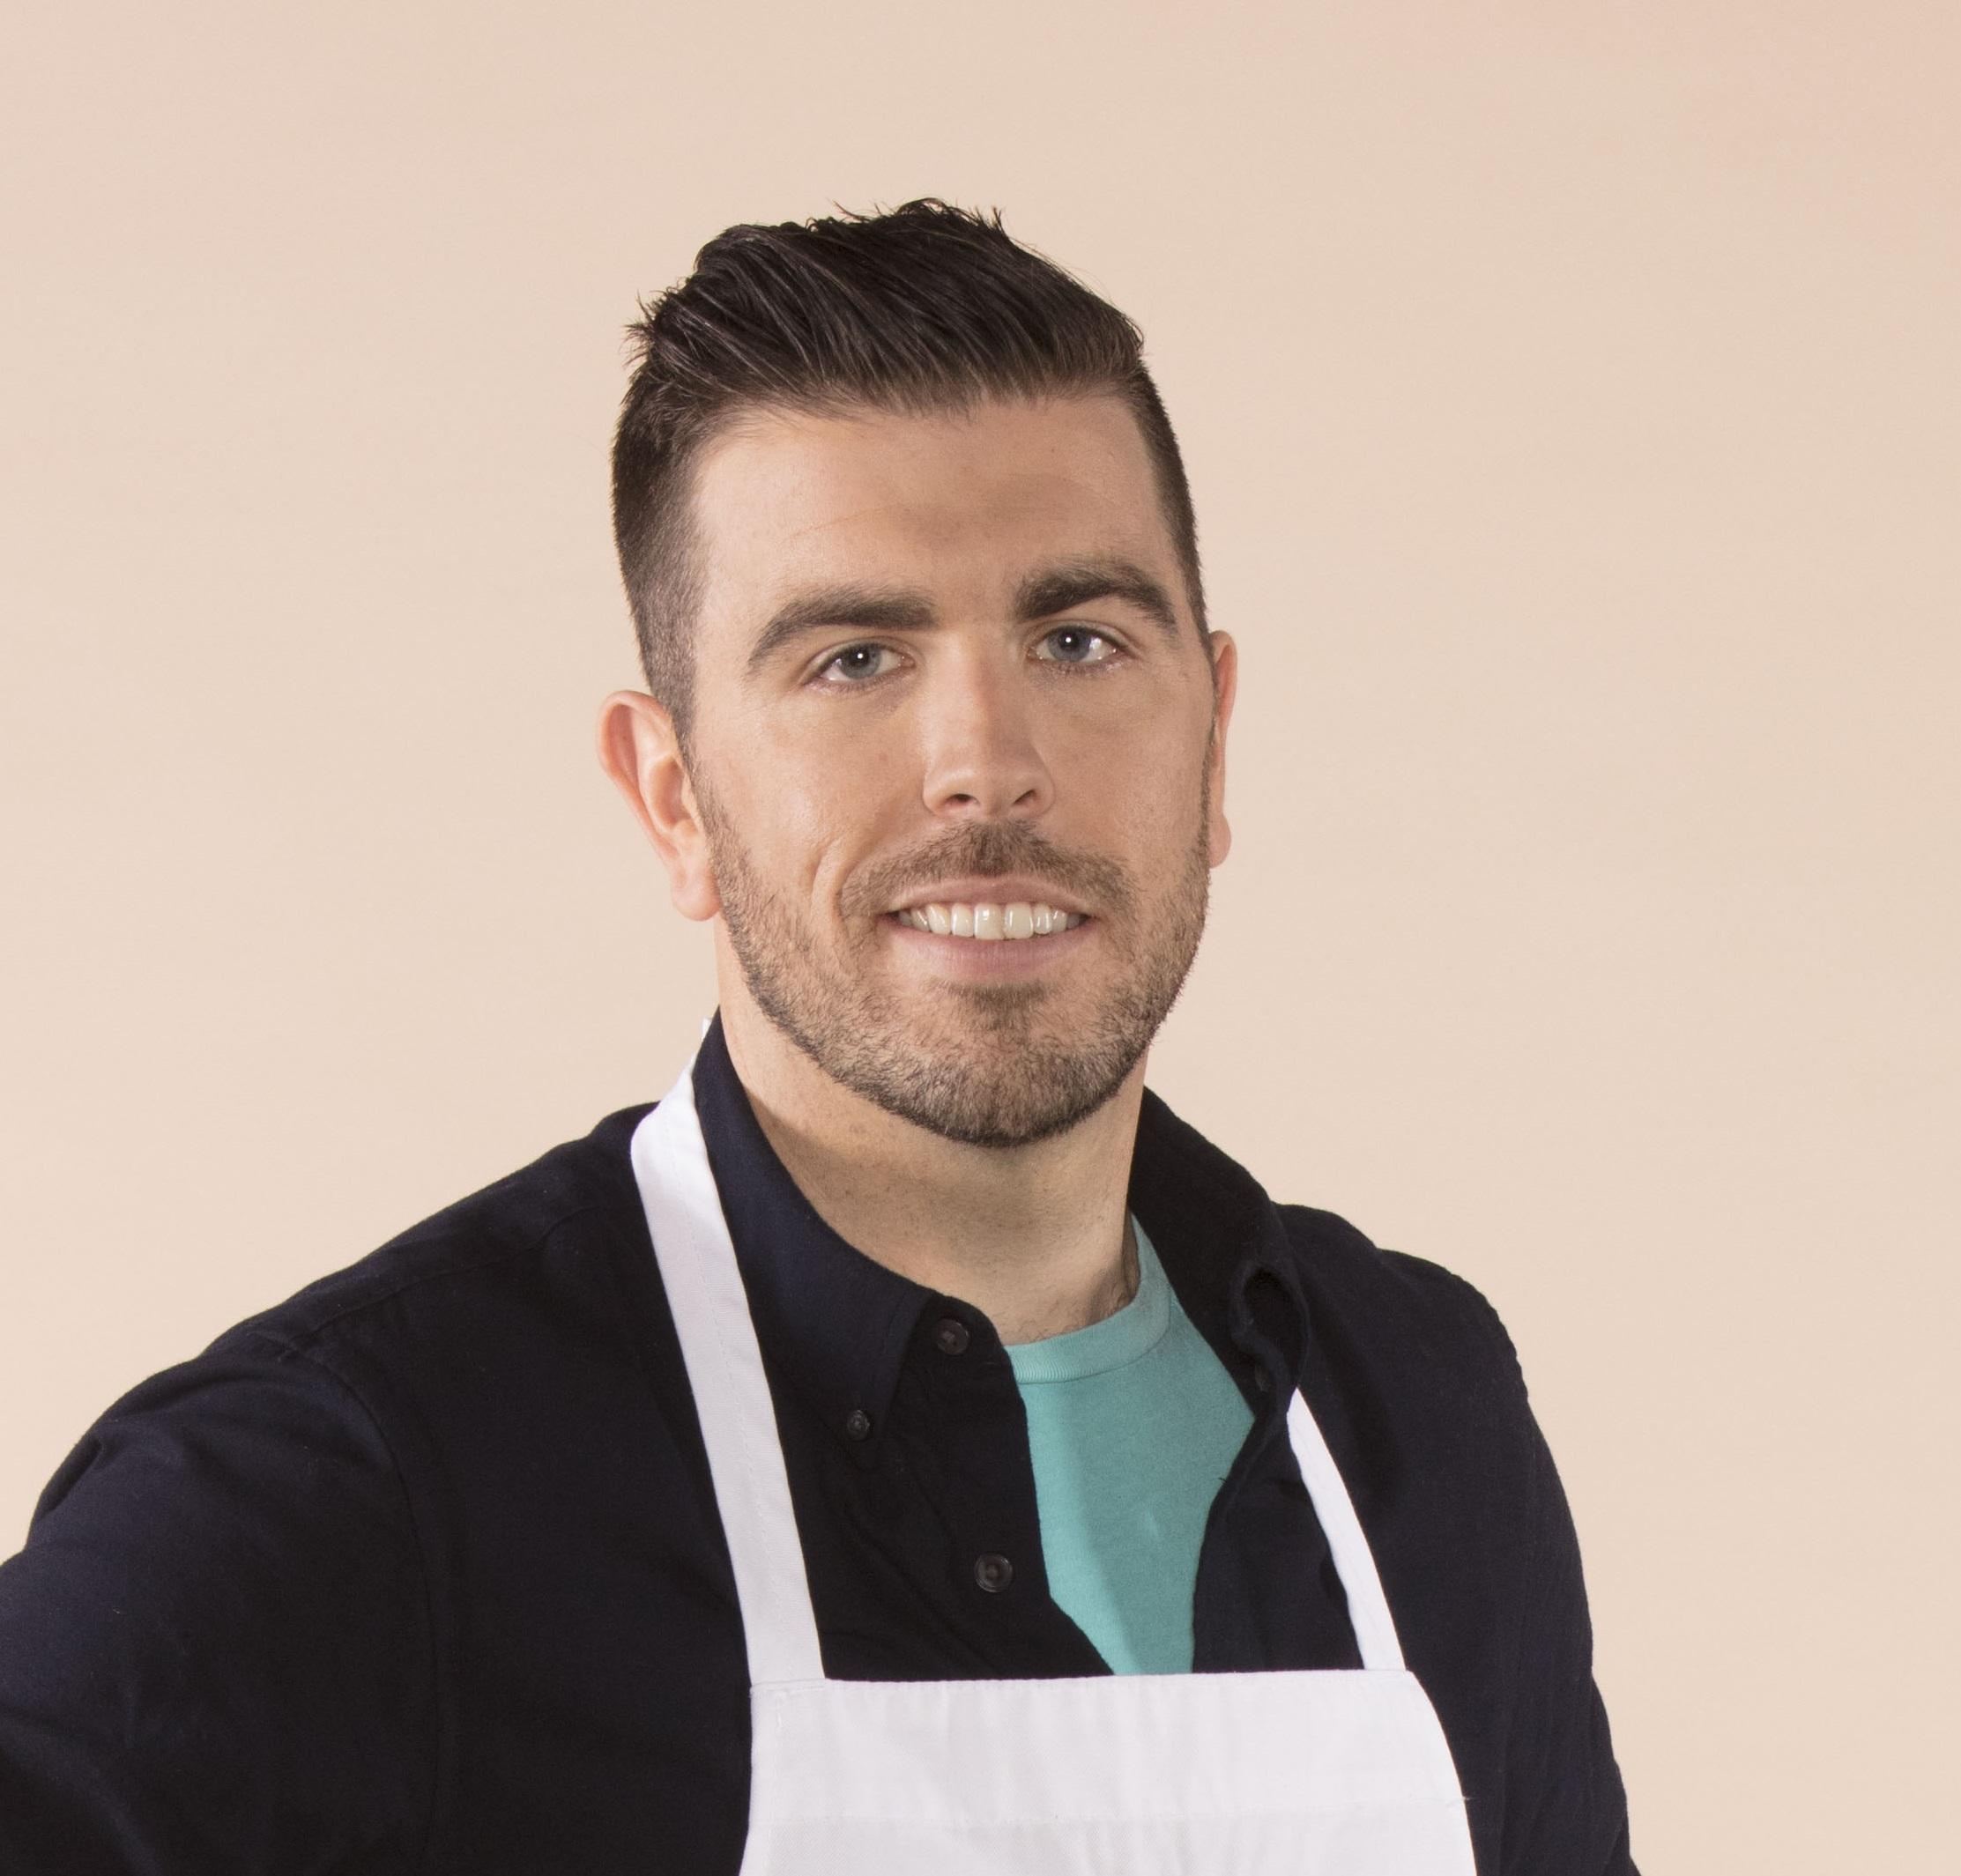 Ctv Reveals The Masterchef Canada Season 5 Top 12 Home Cooks Bell Media